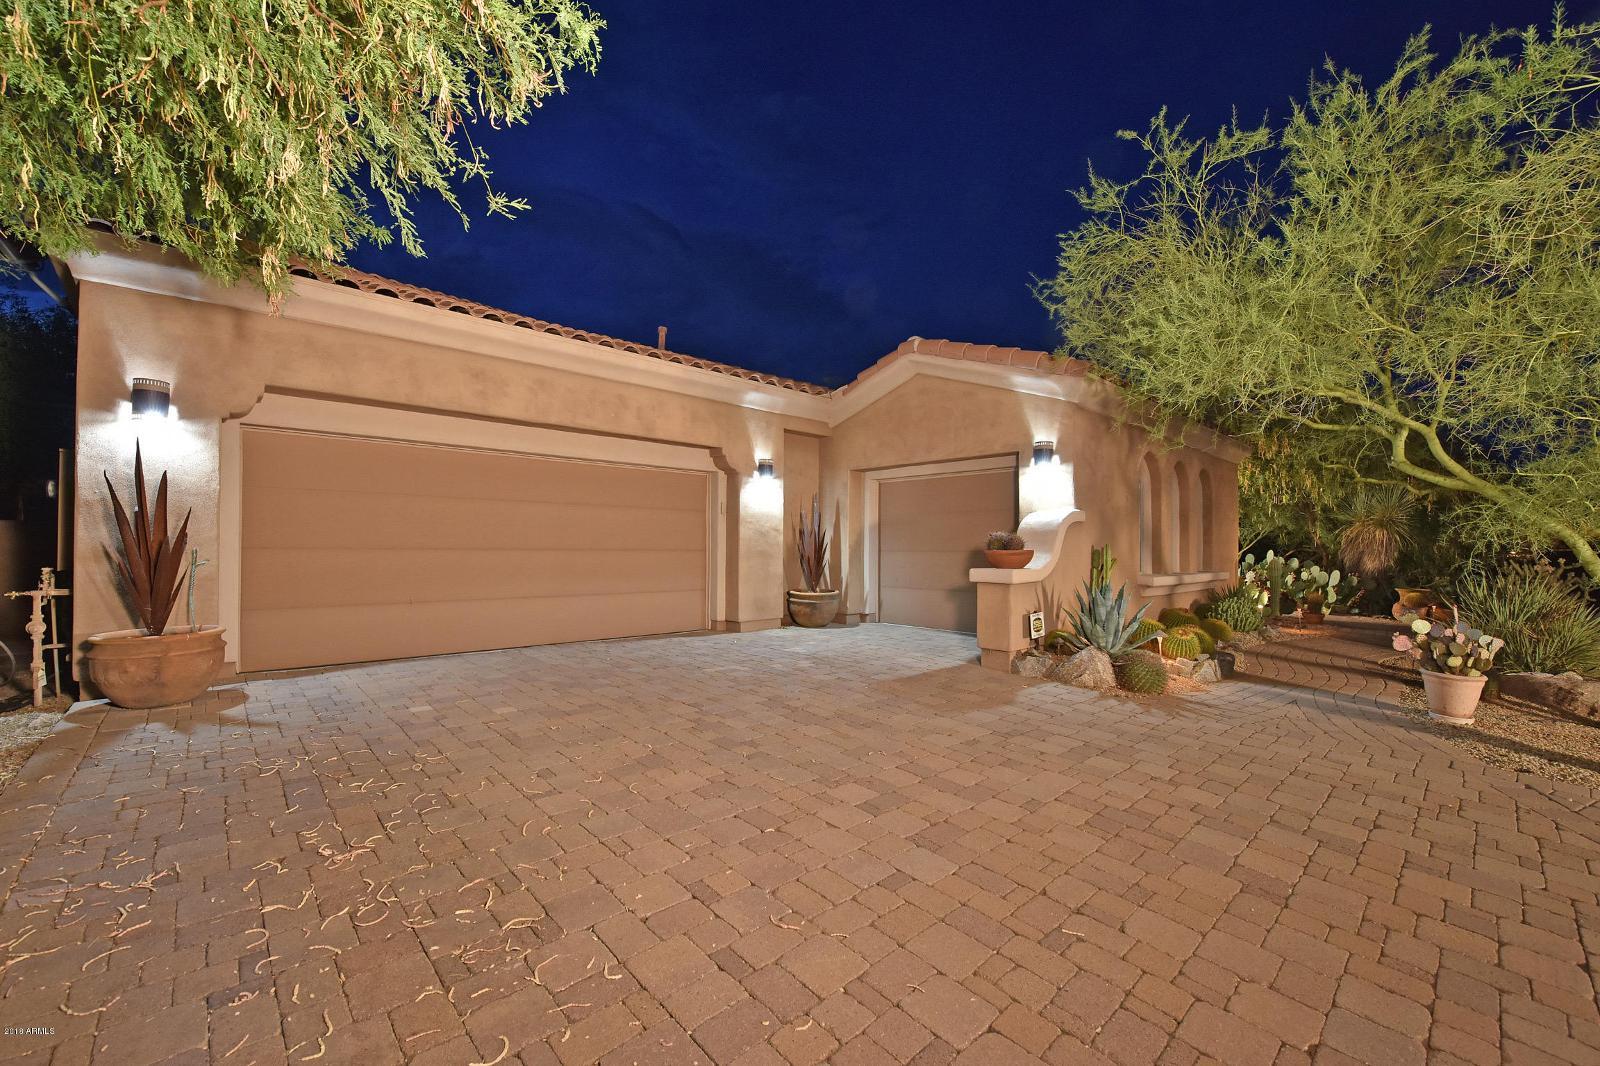 10126 E Happy Hollow Dr, Scottsdale, AZ — MLS# 5780525 — Better ...